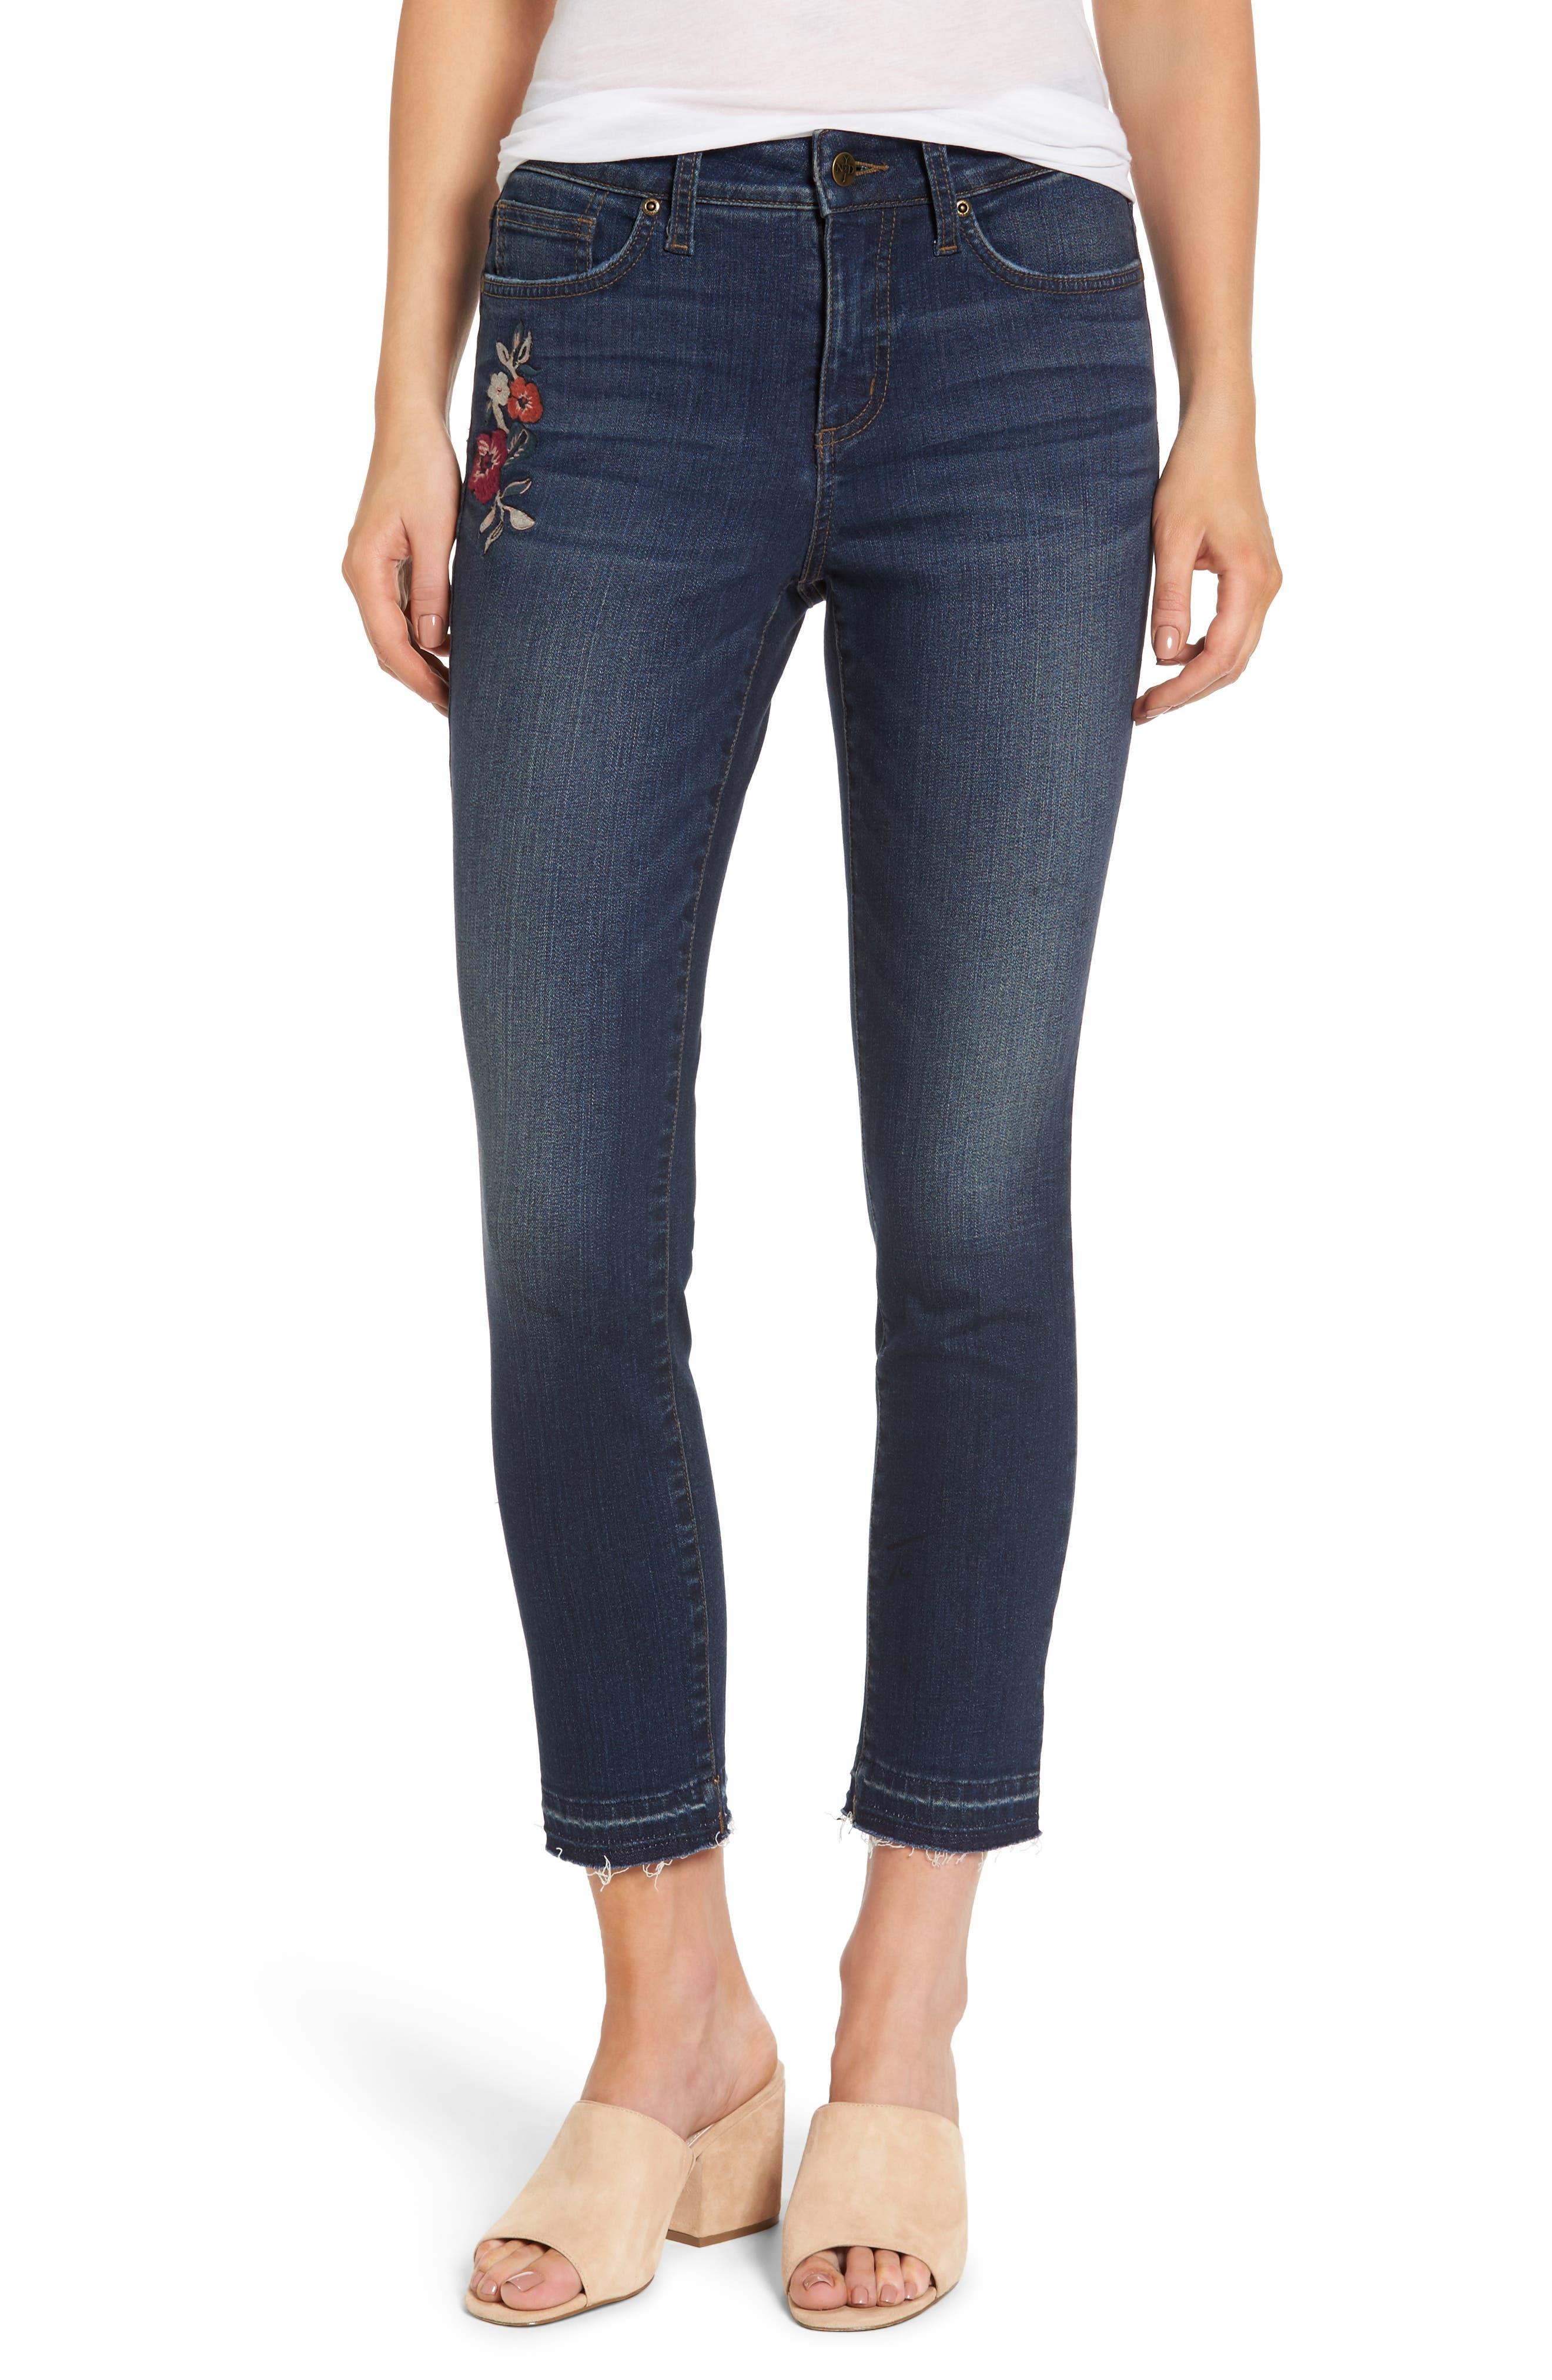 NYDJ Alina Embroidered Stretch Skinny Ankle Jeans (Horizon)